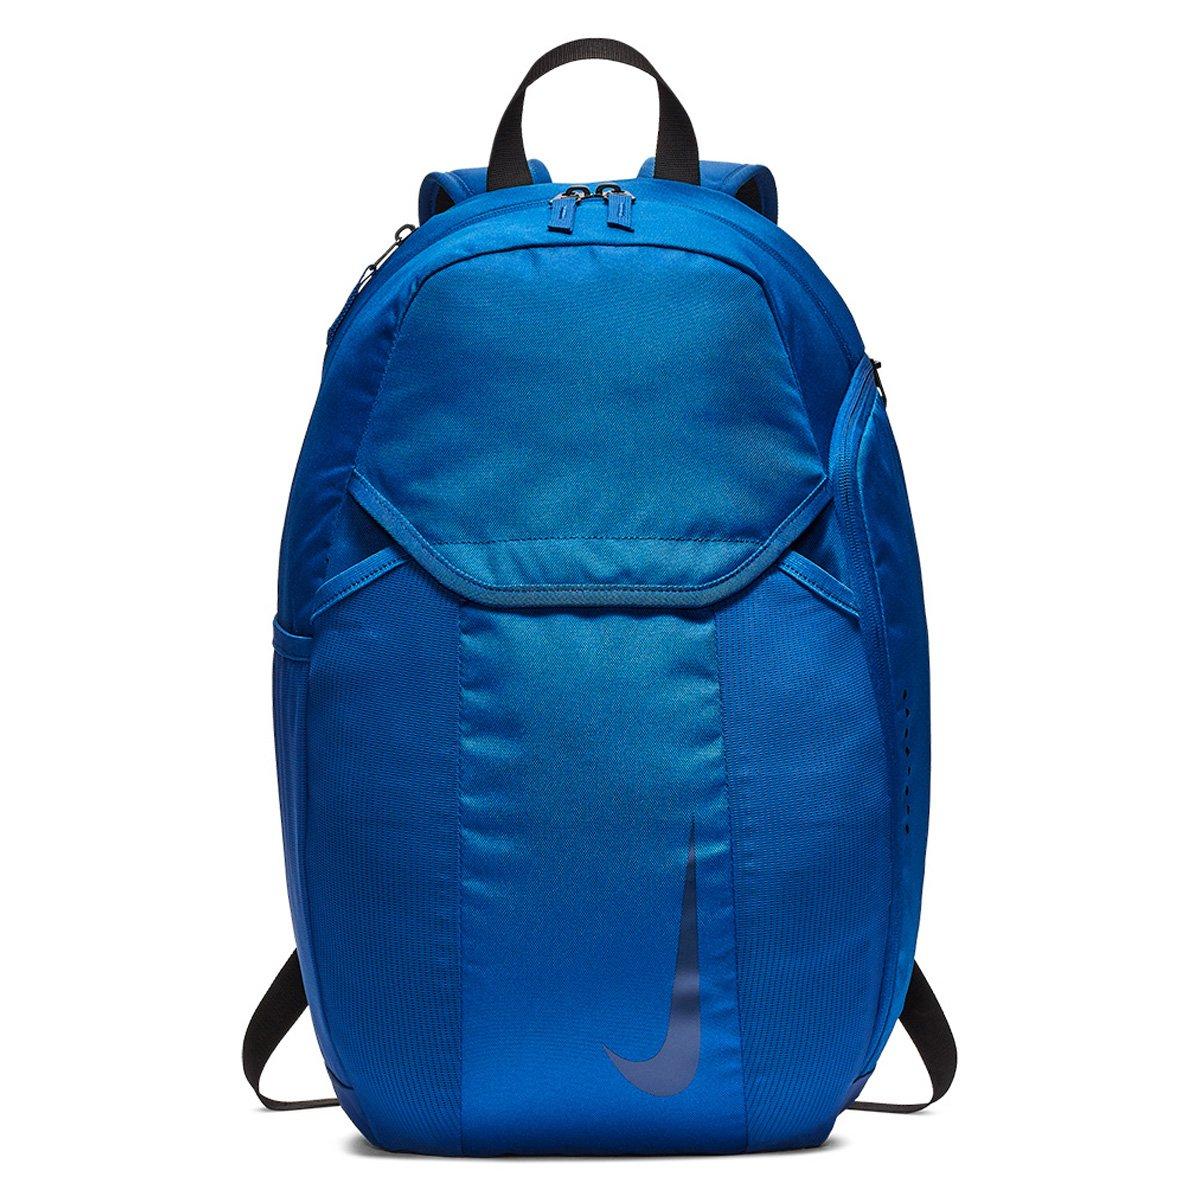 Academy Azul Nike Backpack Preto Mochila E qMVpUjSzGL